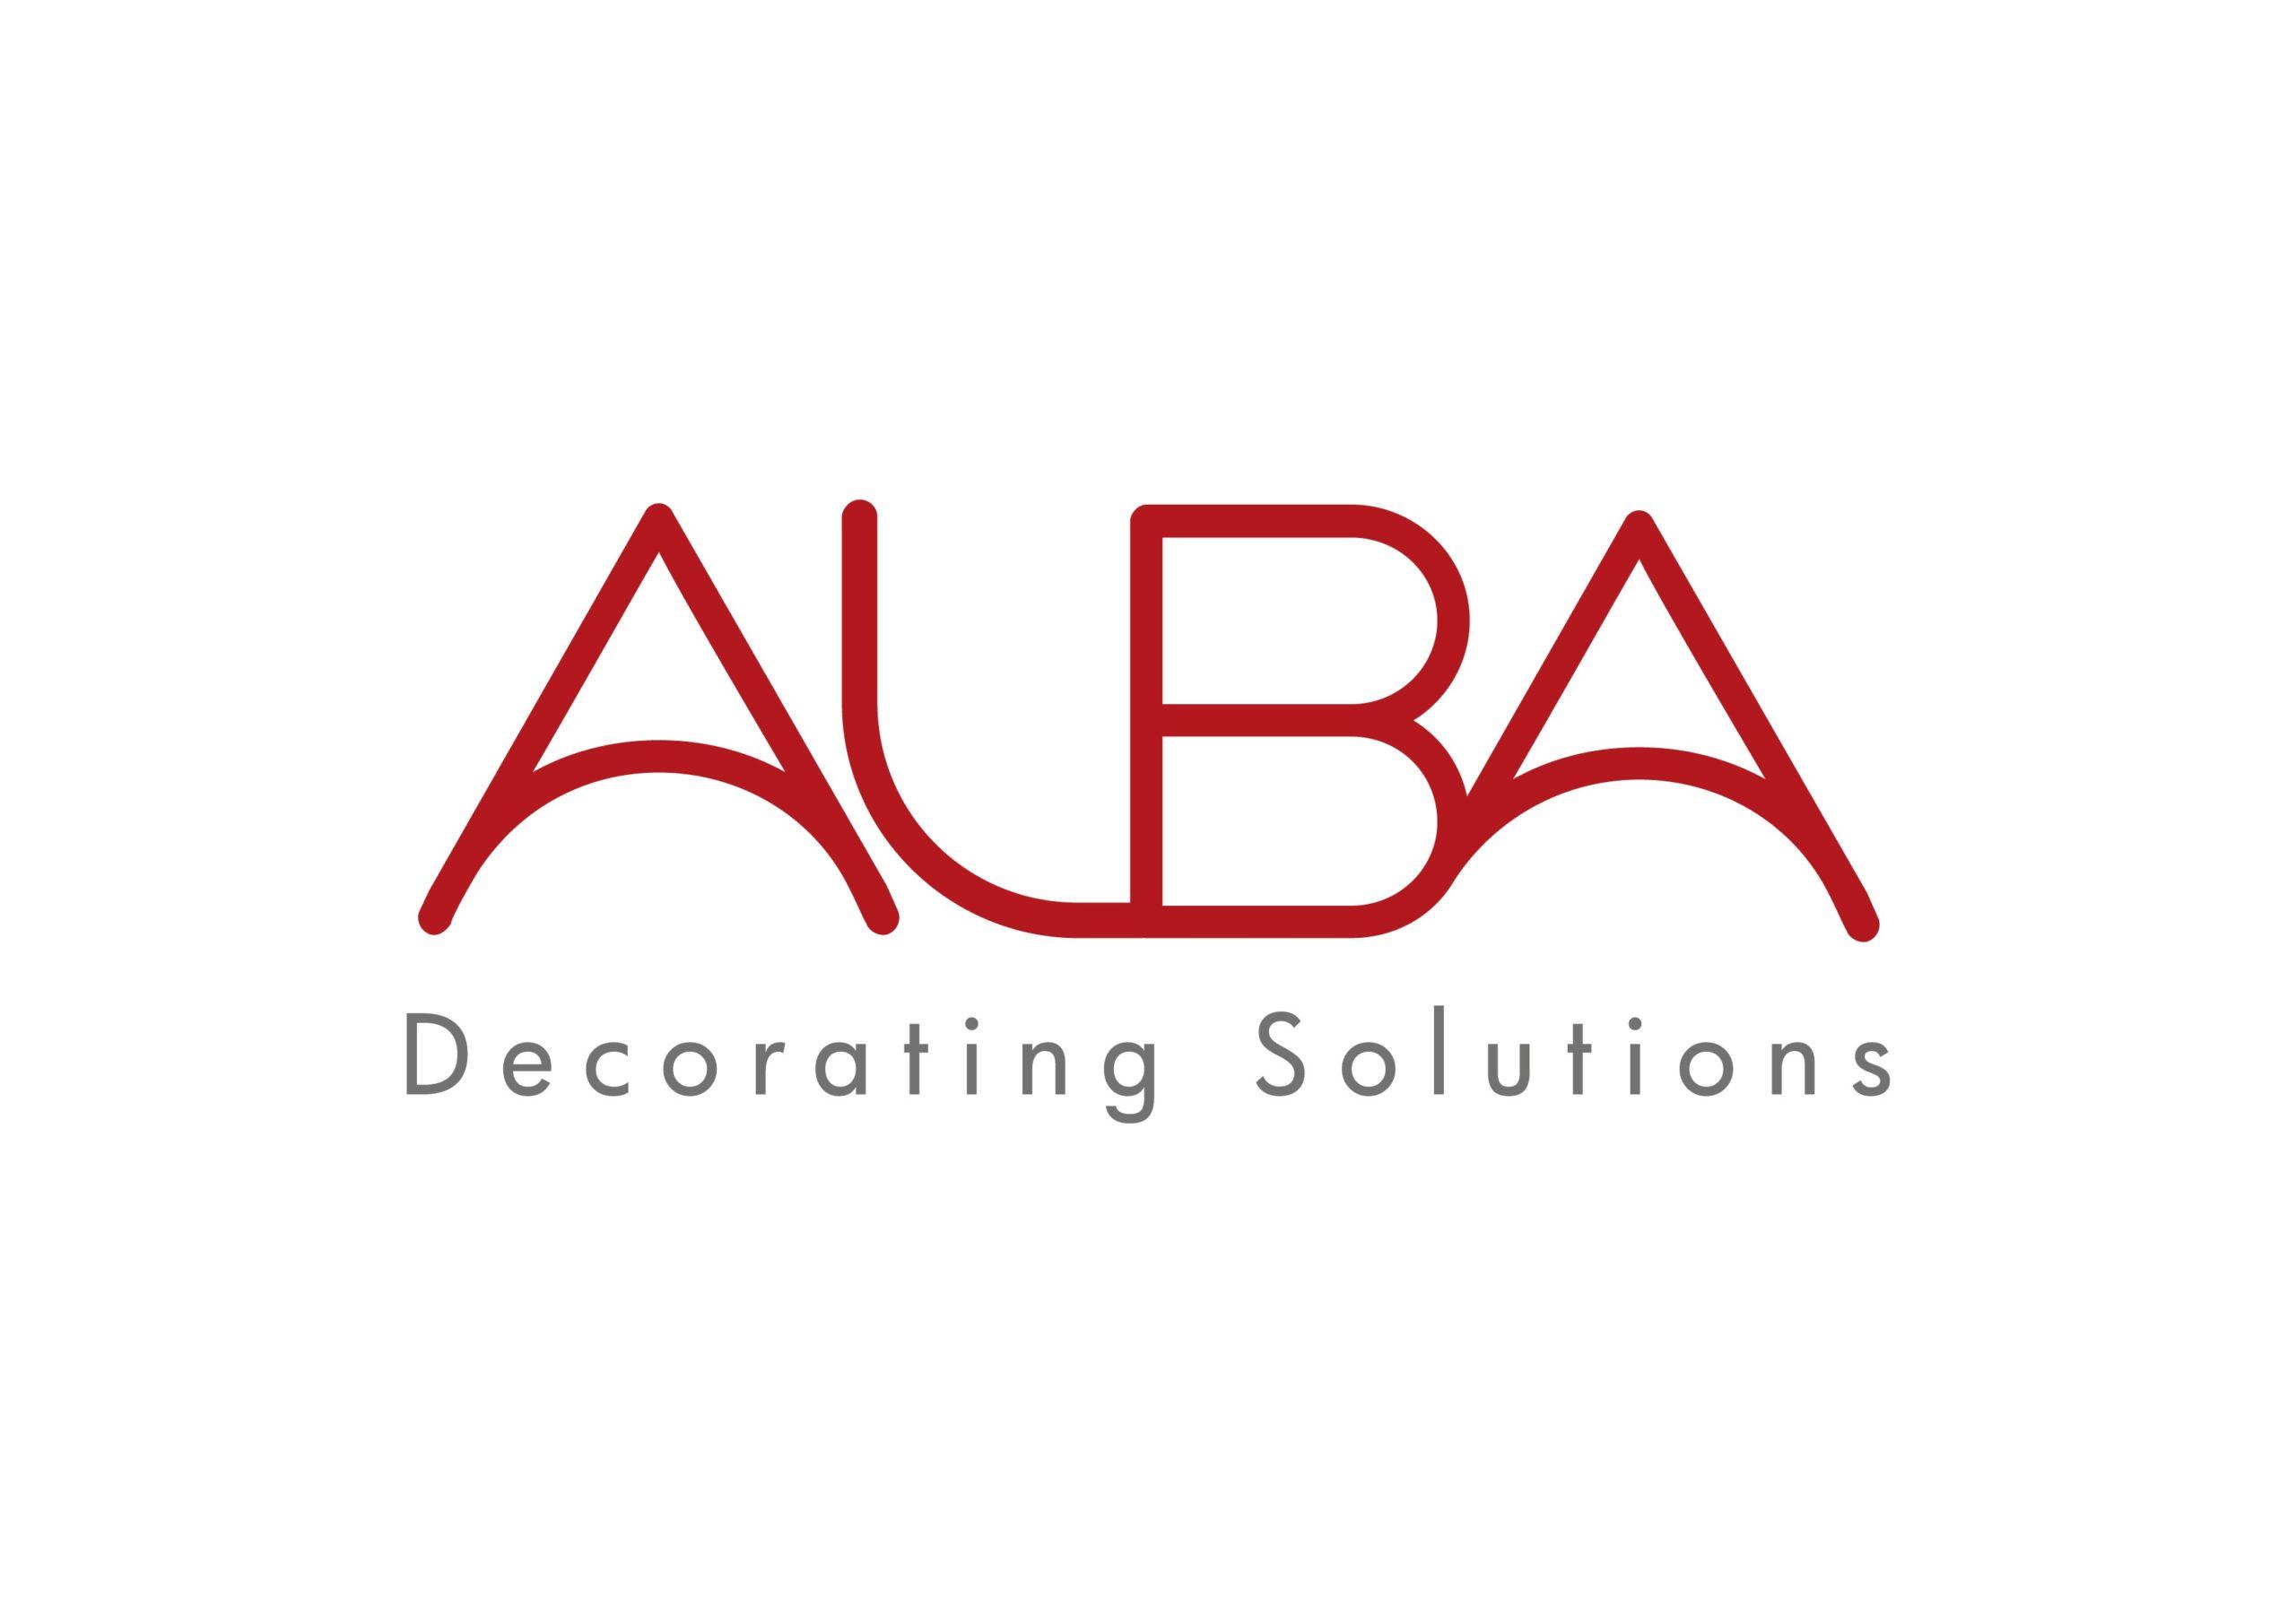 ALBA Decorating Solutions